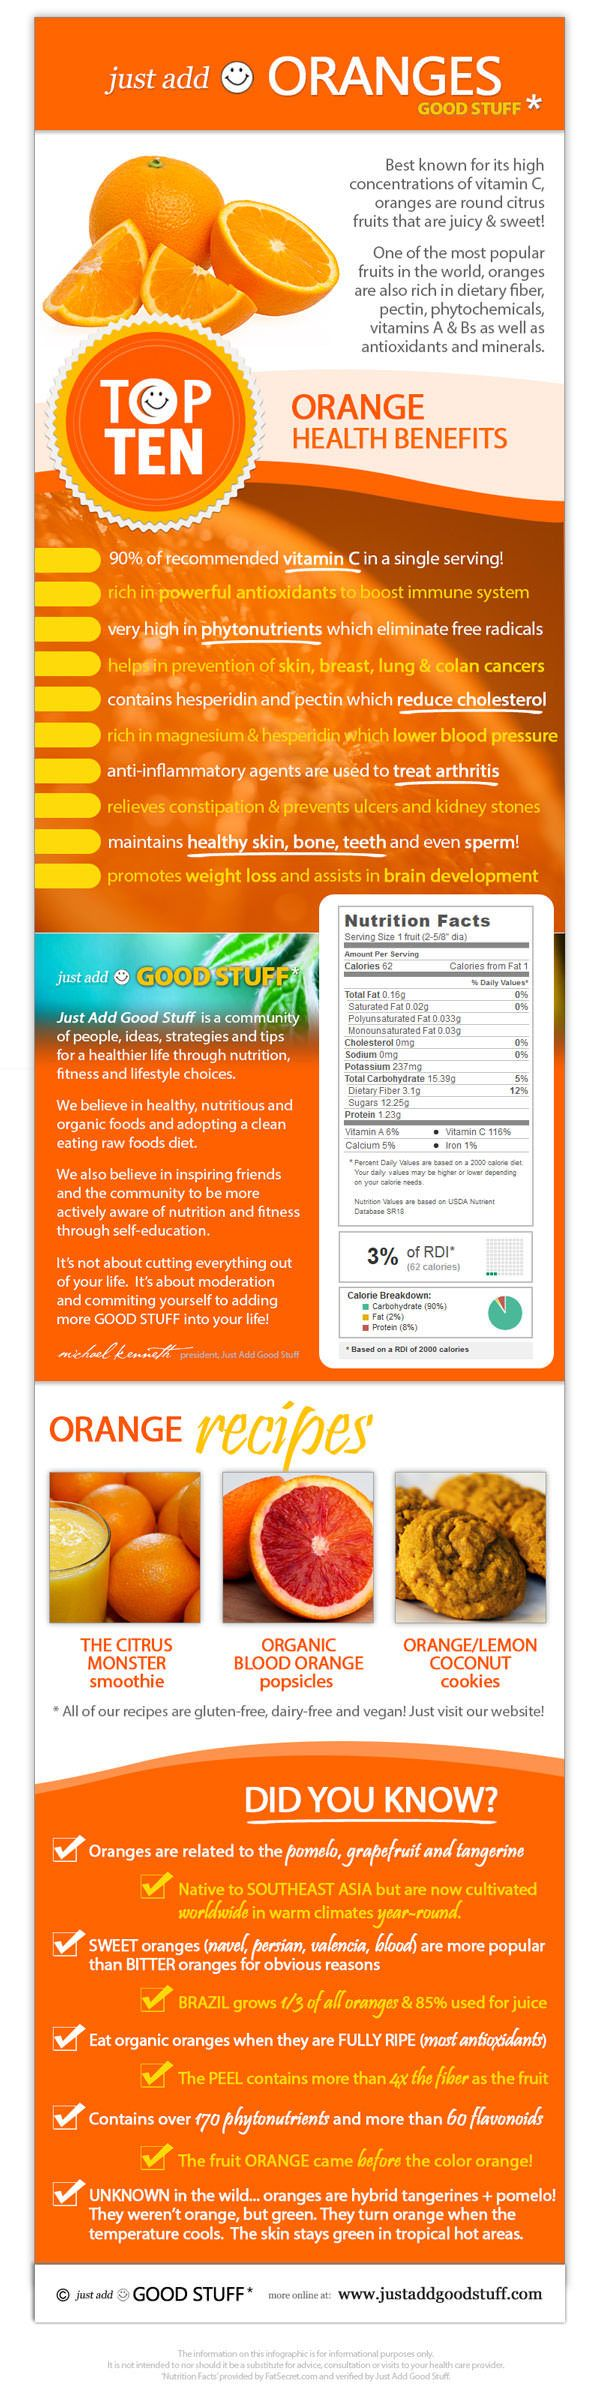 Top 10 Orange Health Benefits